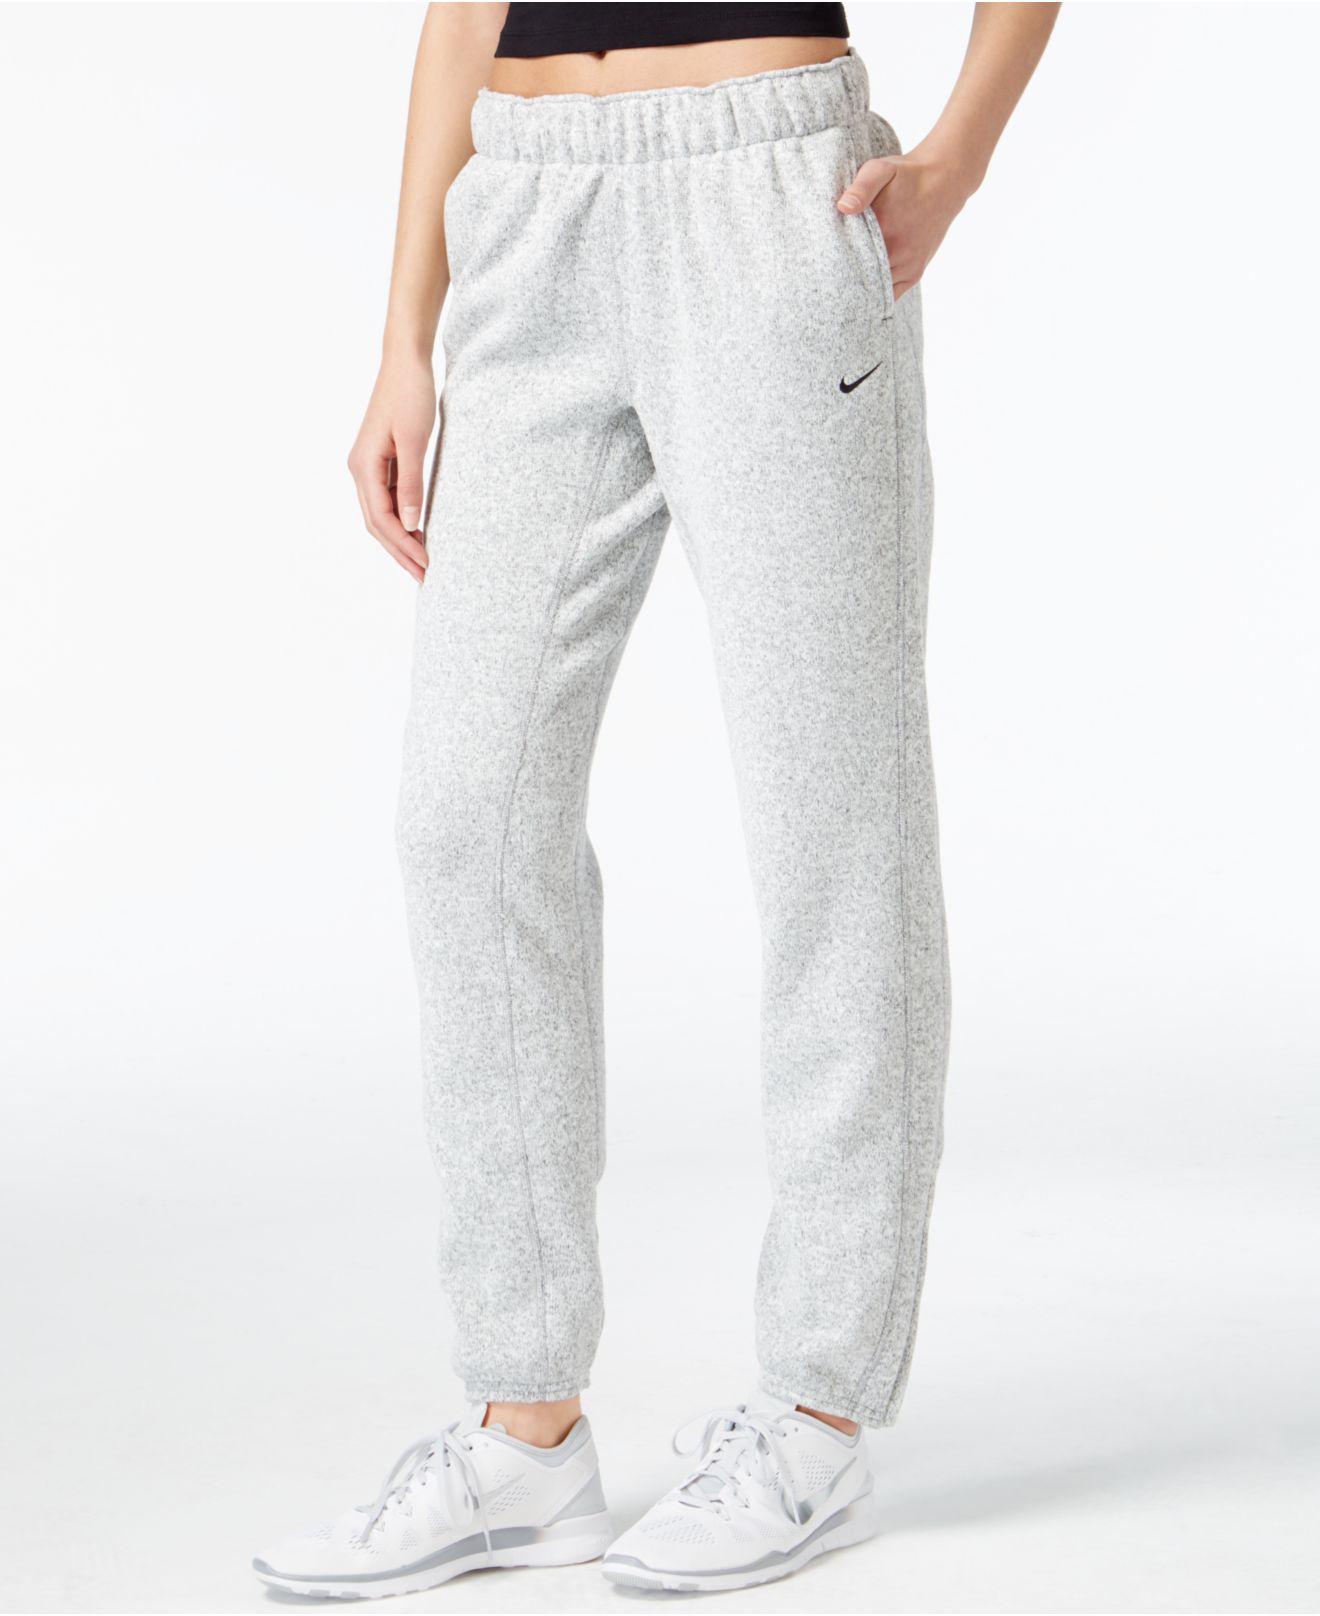 And Sweatshirts Nike Bcd House Tofu Pants 5Yx7Z4wx